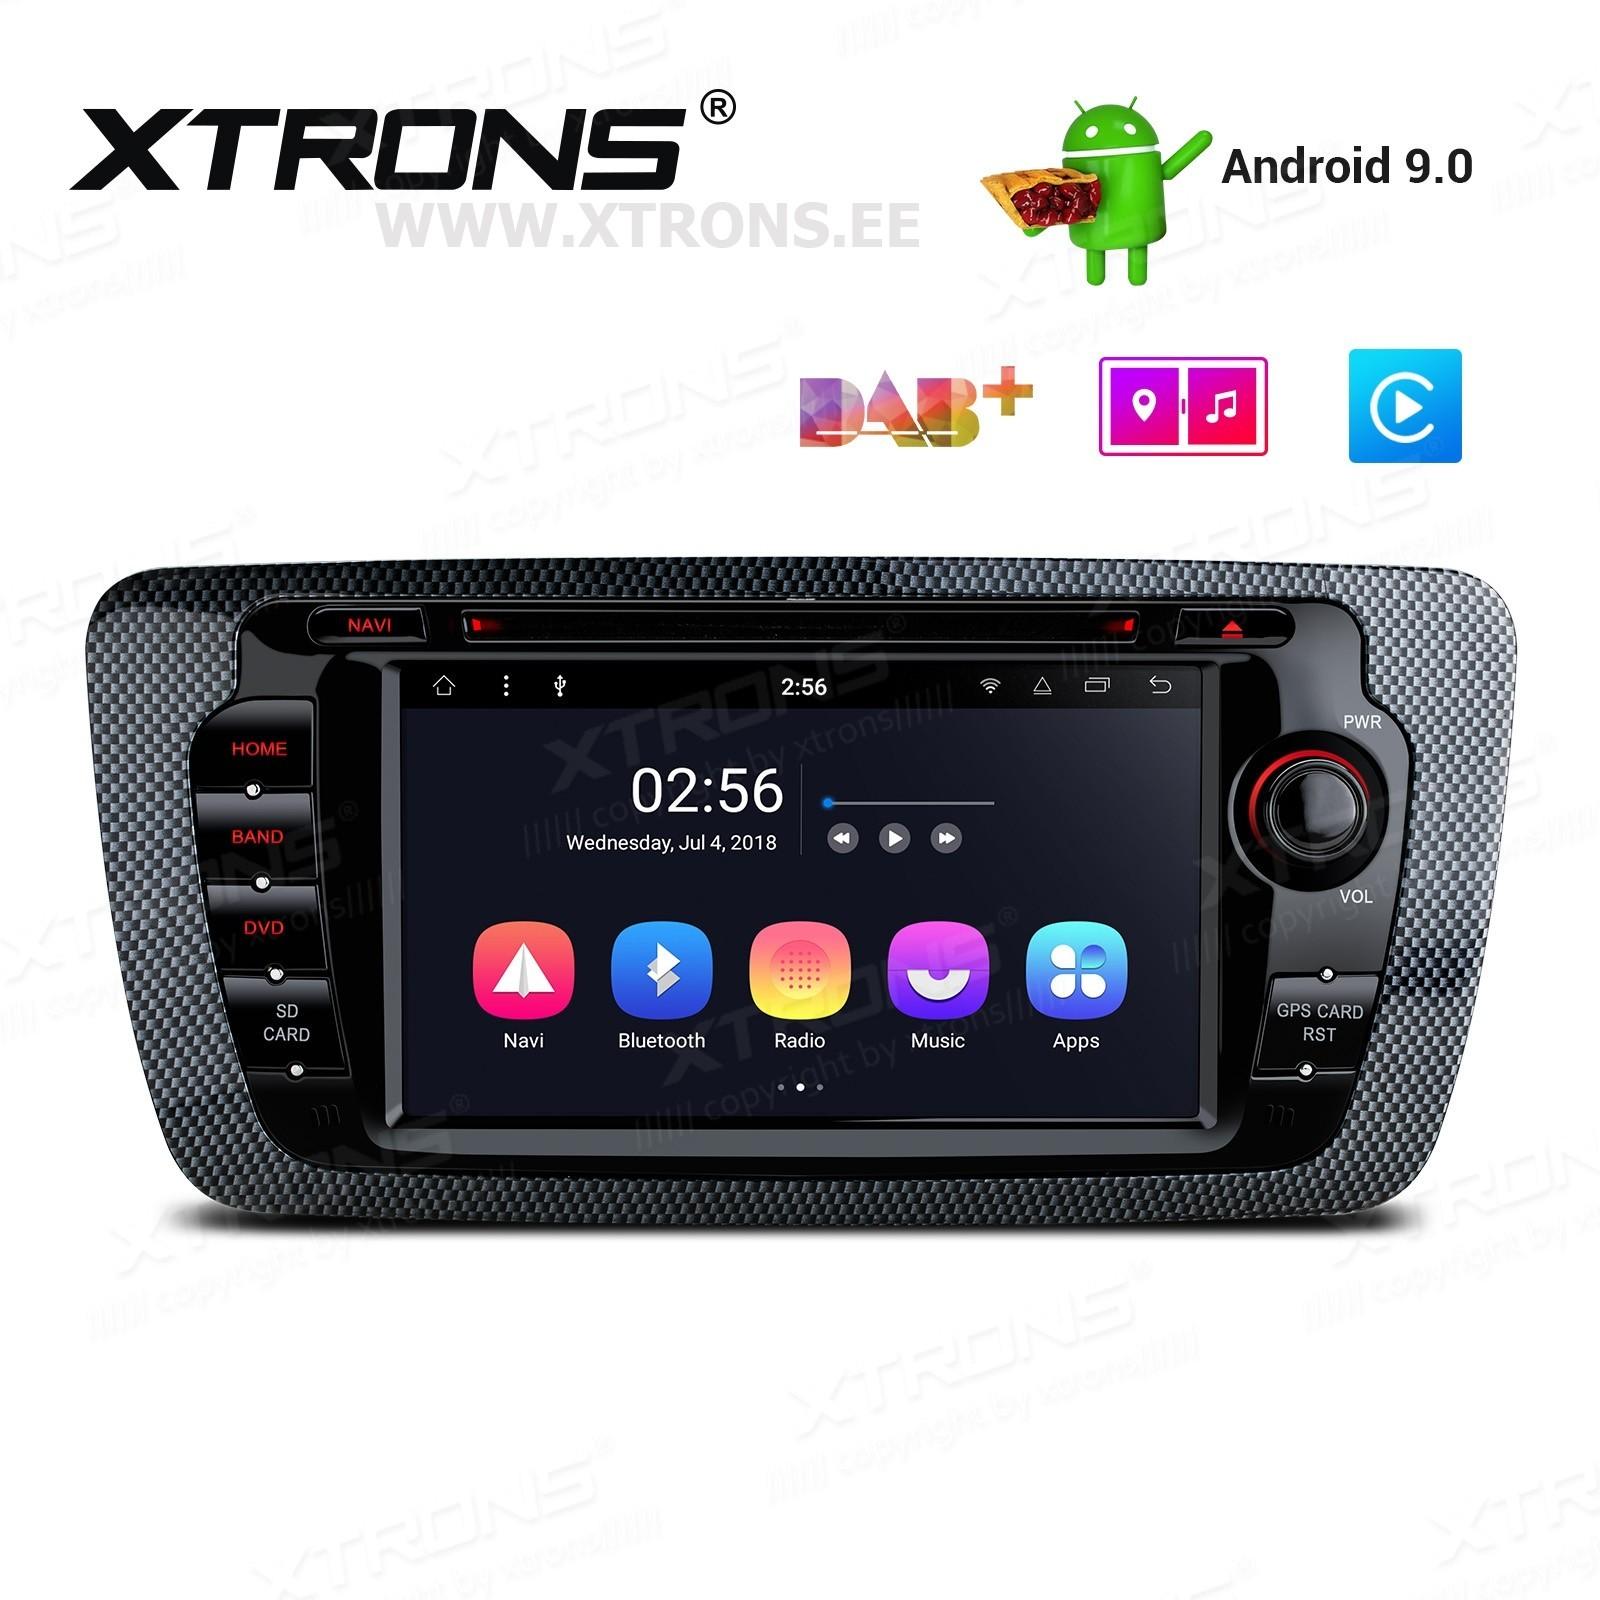 XTRONS PR79IBS